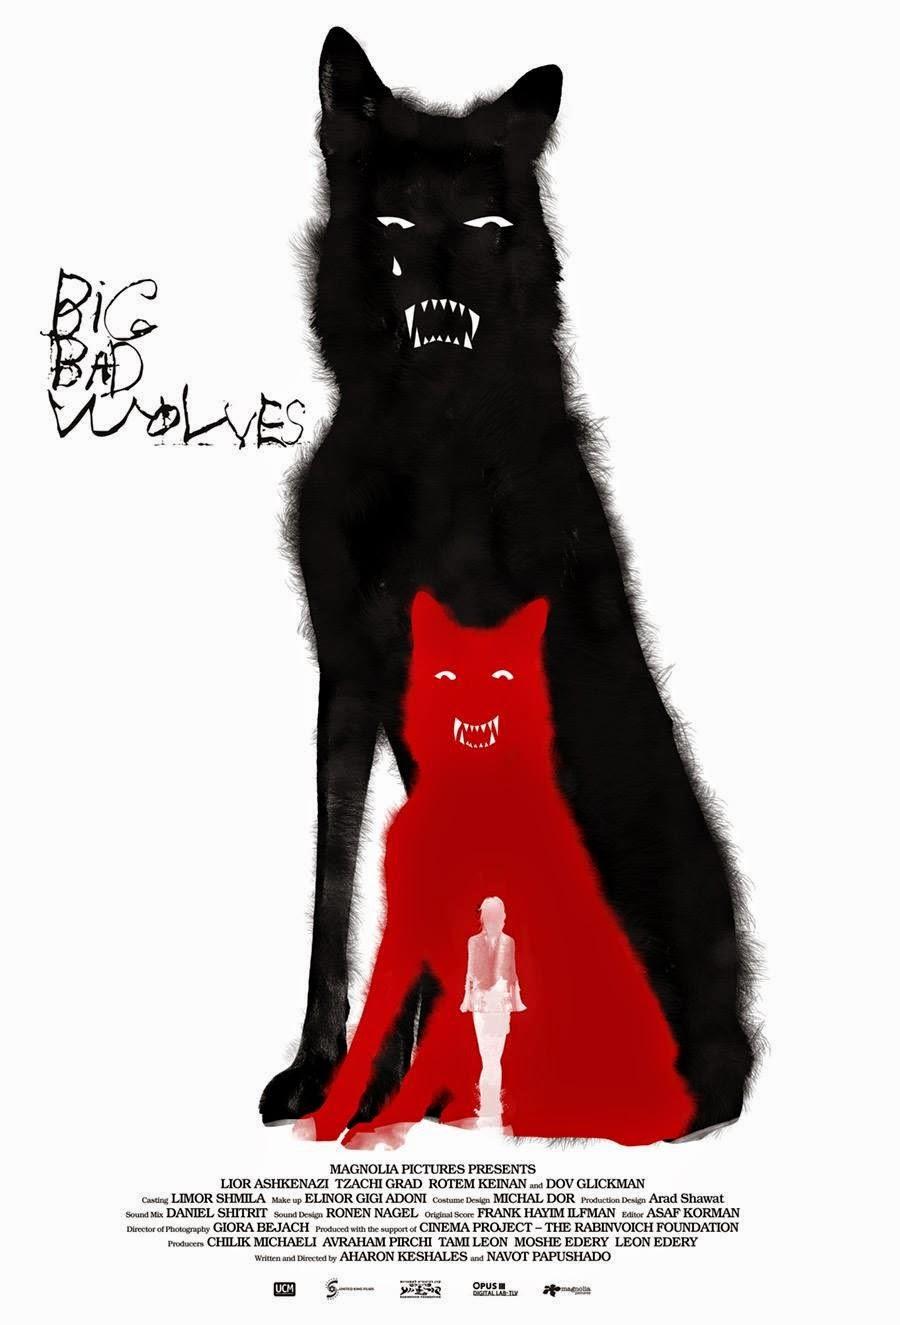 ¡Cartelicos!: Big Bad Wolves